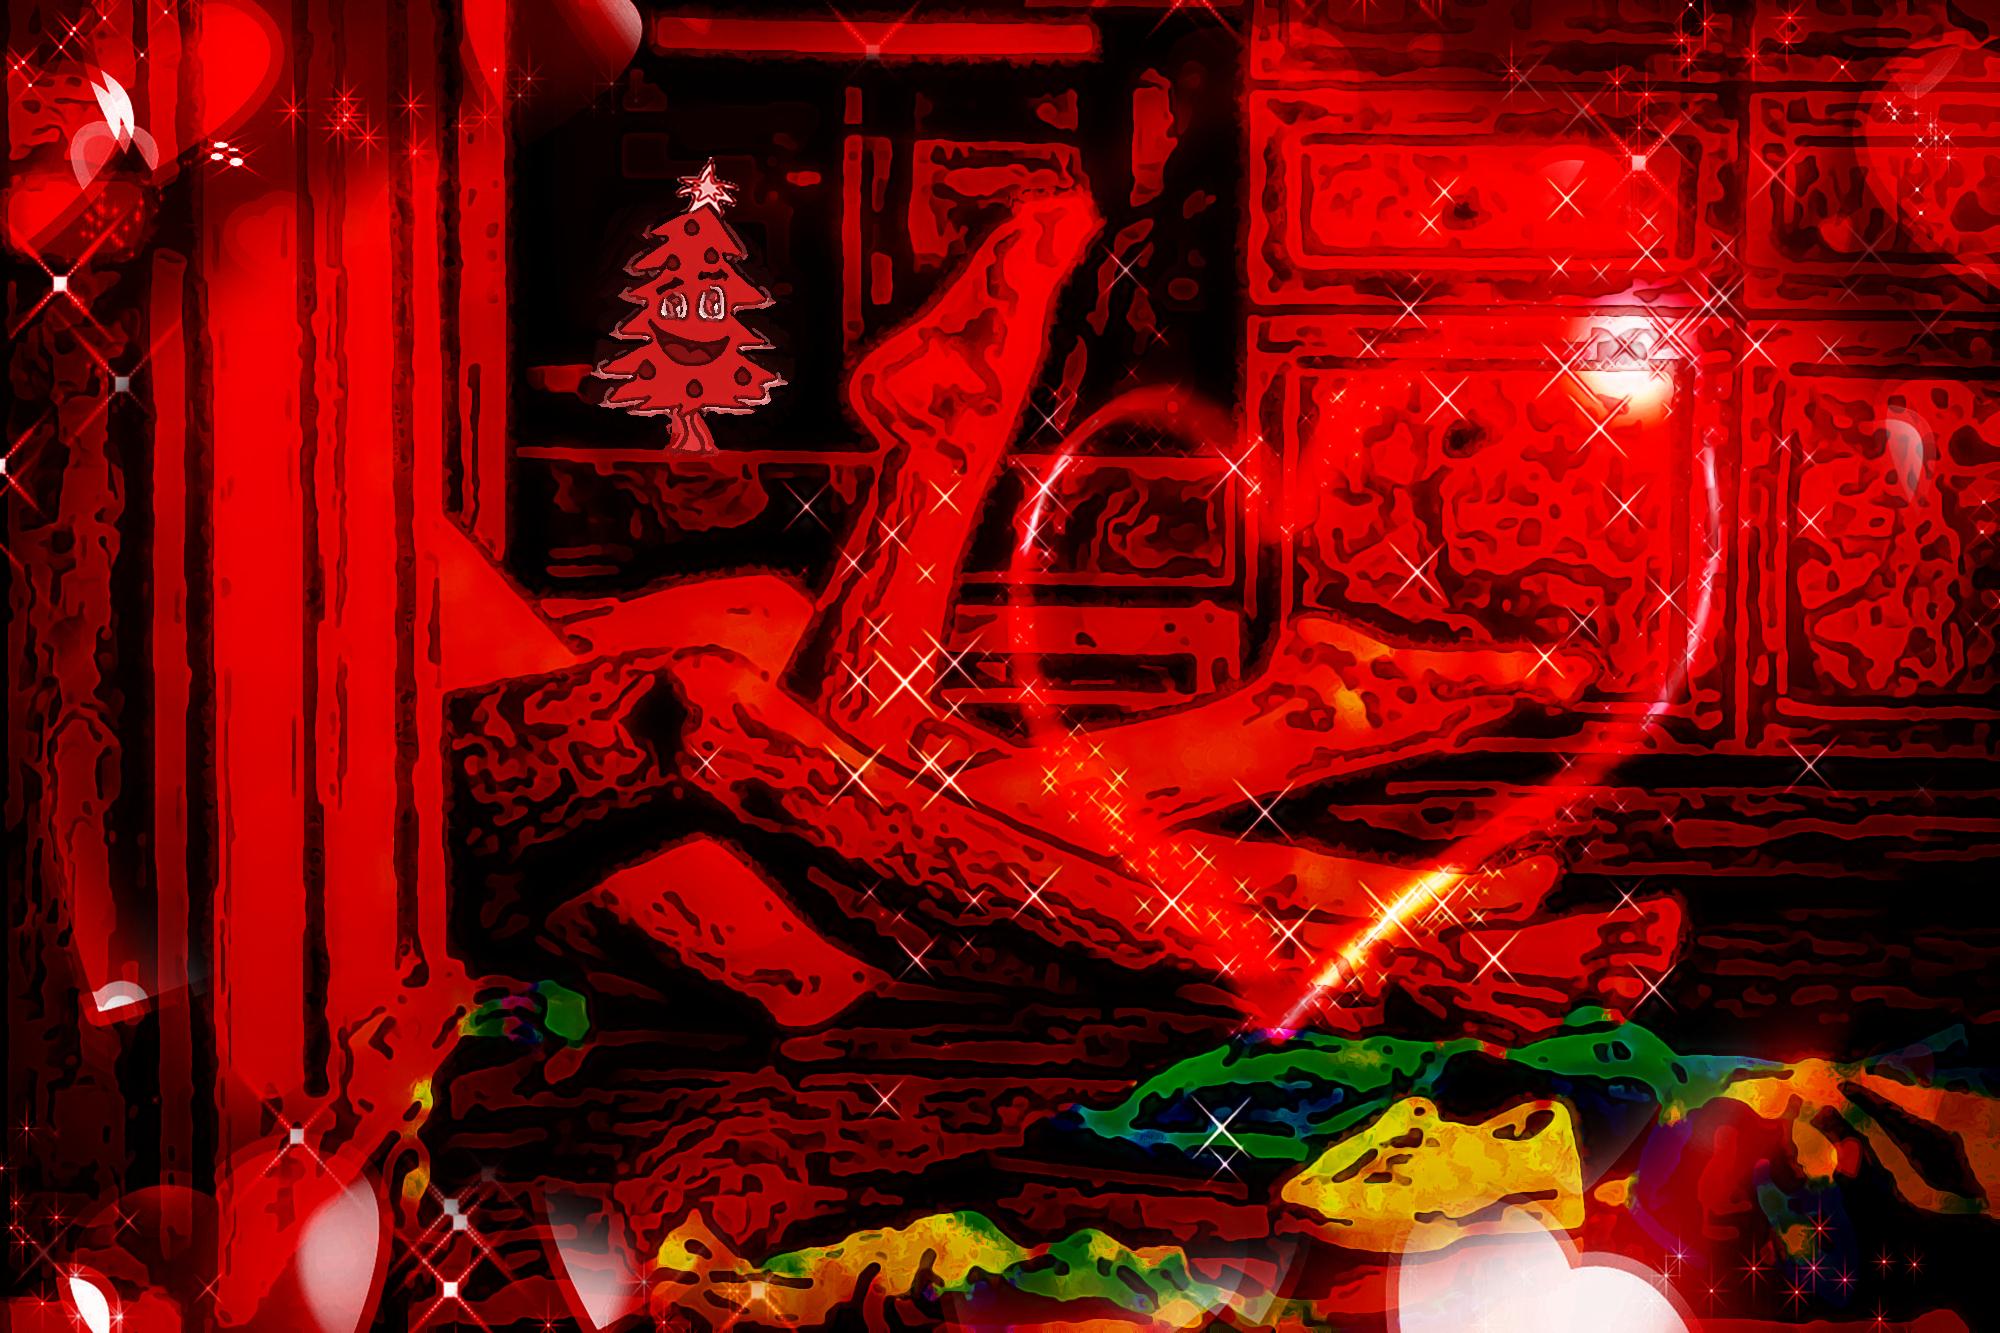 Buon Natale 2020 - No paura day, no paura world, no paura love, no medical tyranny, no great reset - pittura digitale di Francesco Galgani (12 dicembre 2020)